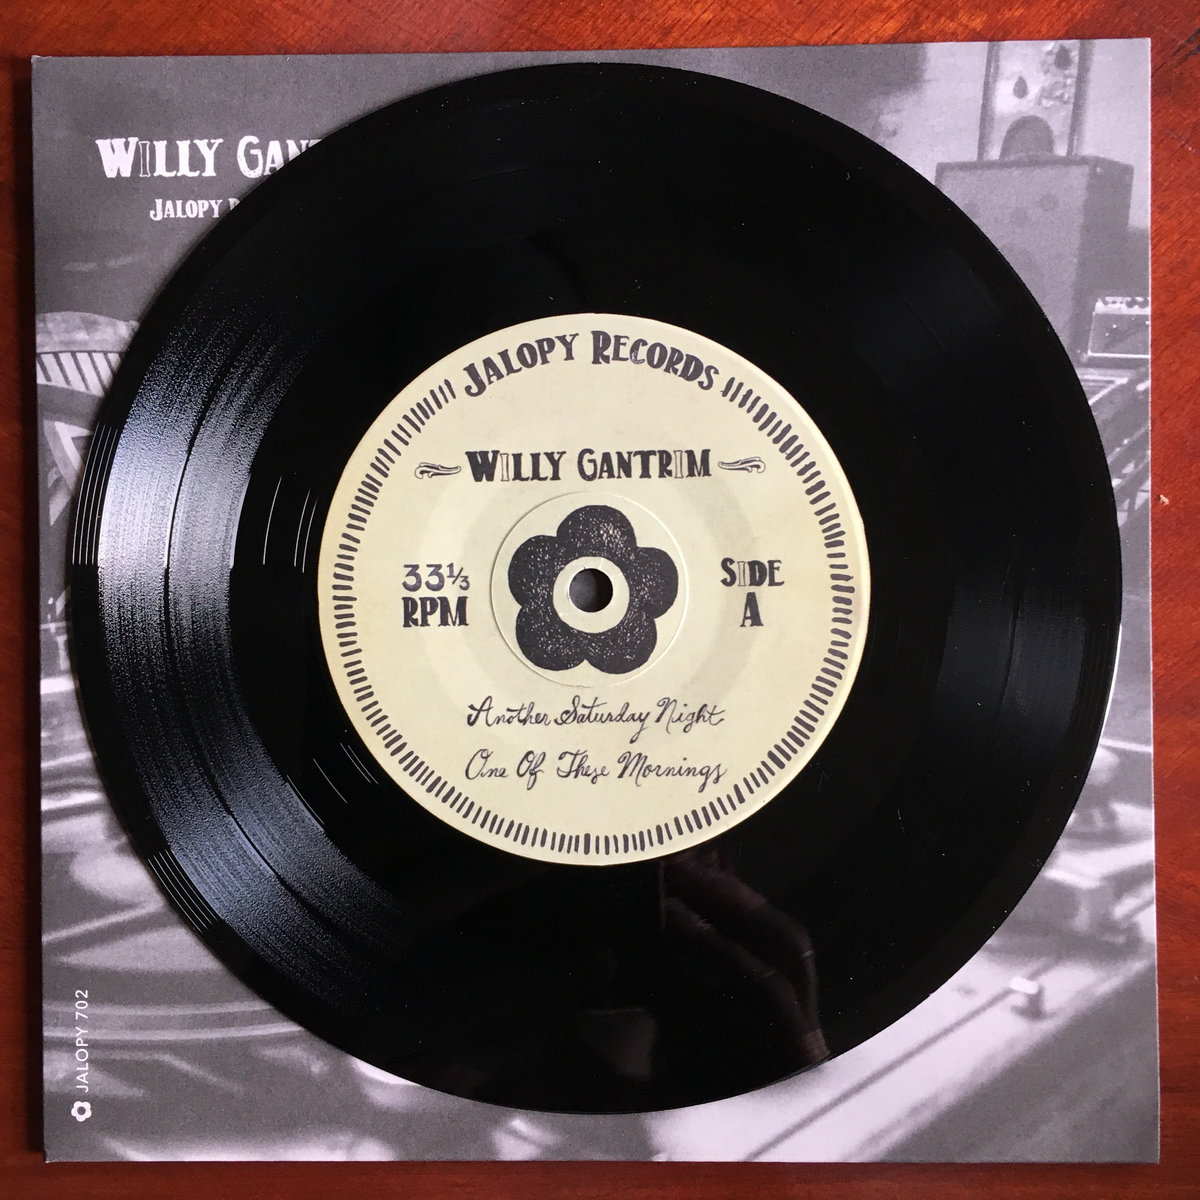 Willy Gantrim, 7 Inch Series | Jalopy Records